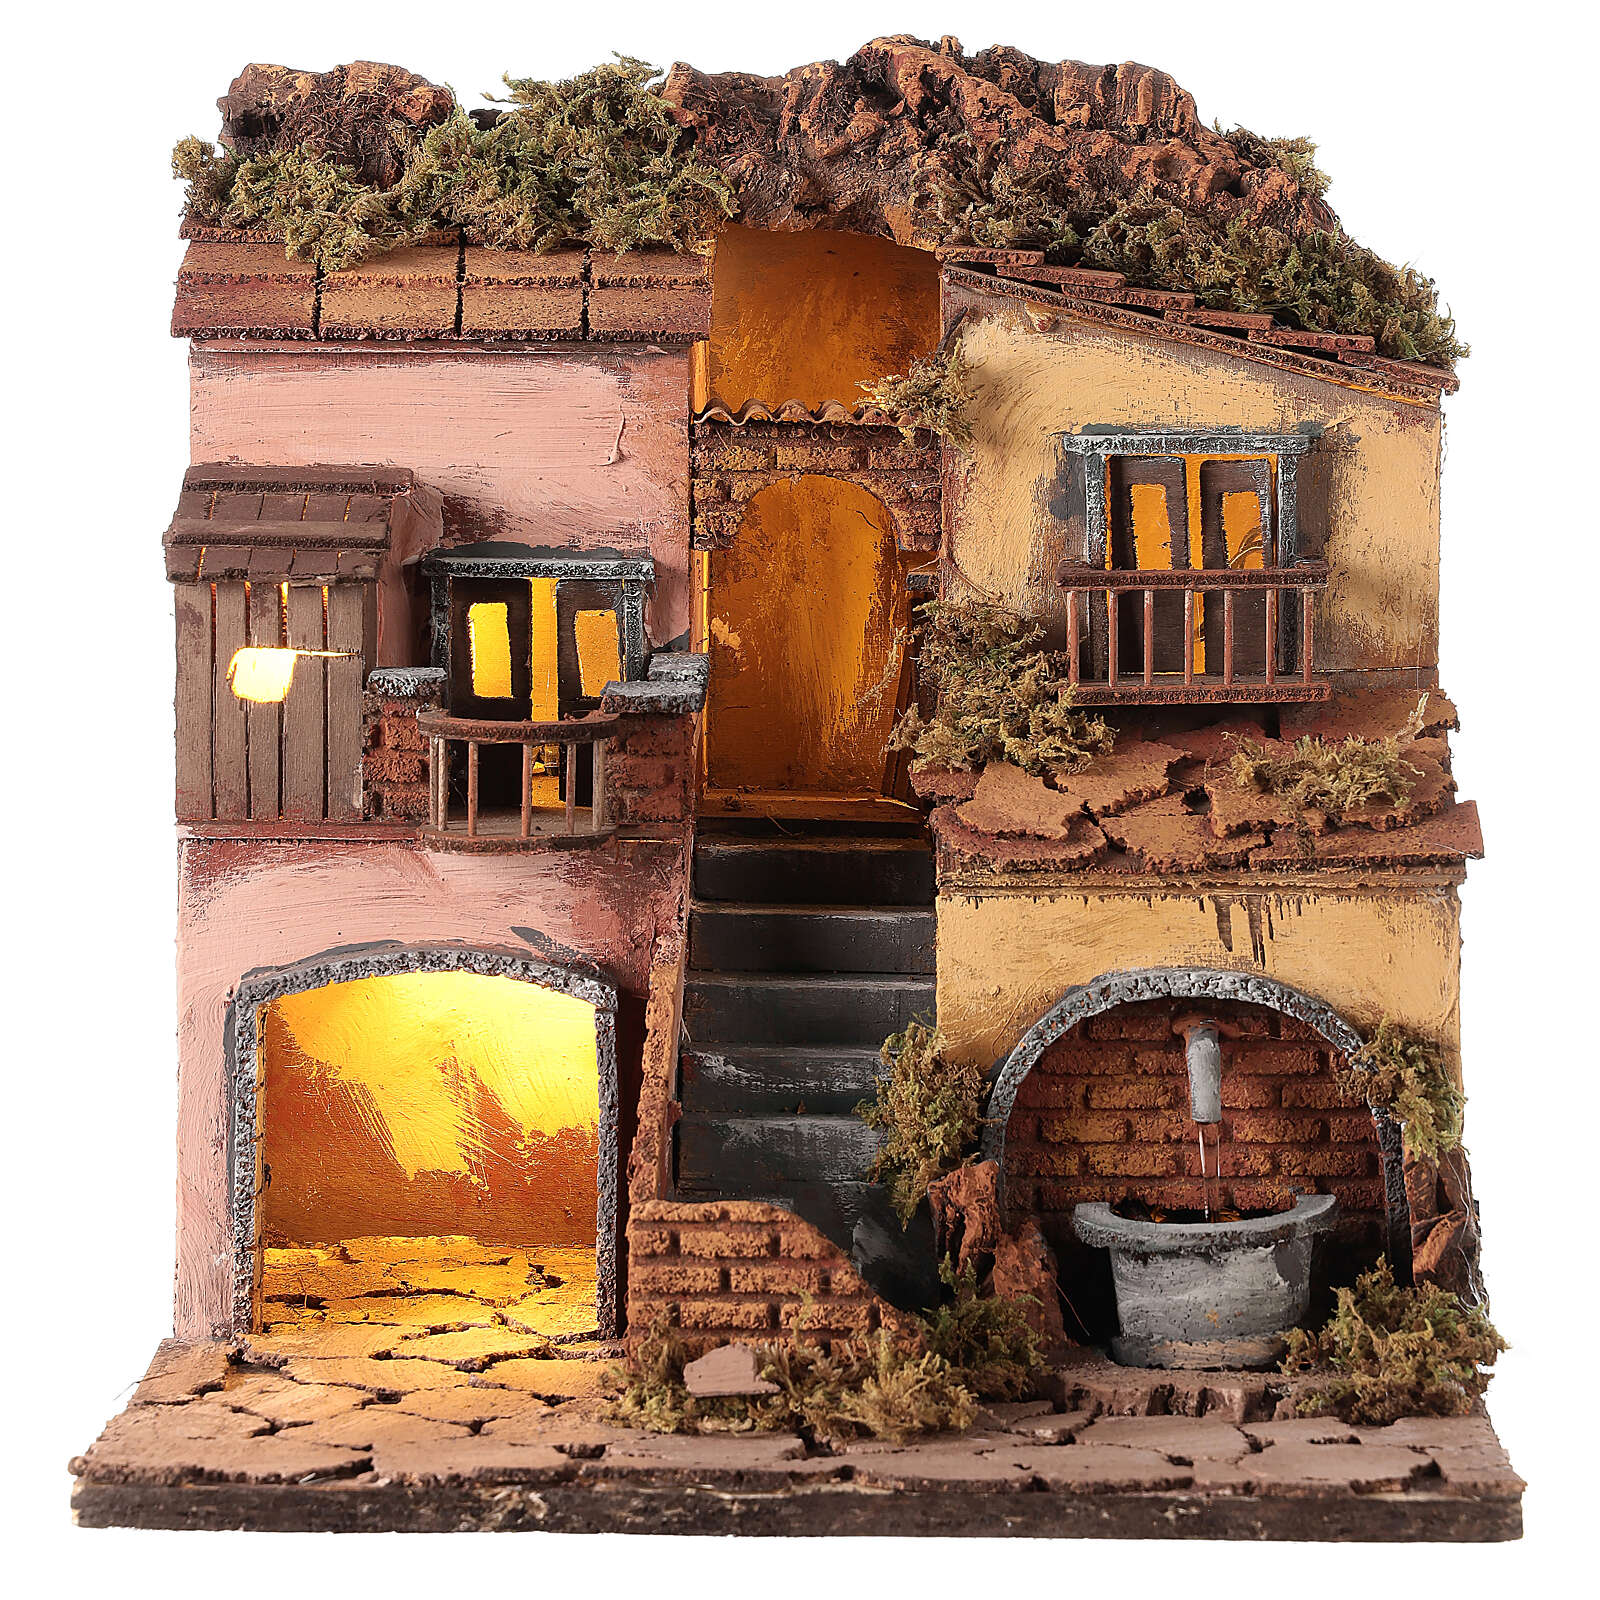 Borgo presepe napoletano stile 700 con fontana 30x30x30 4